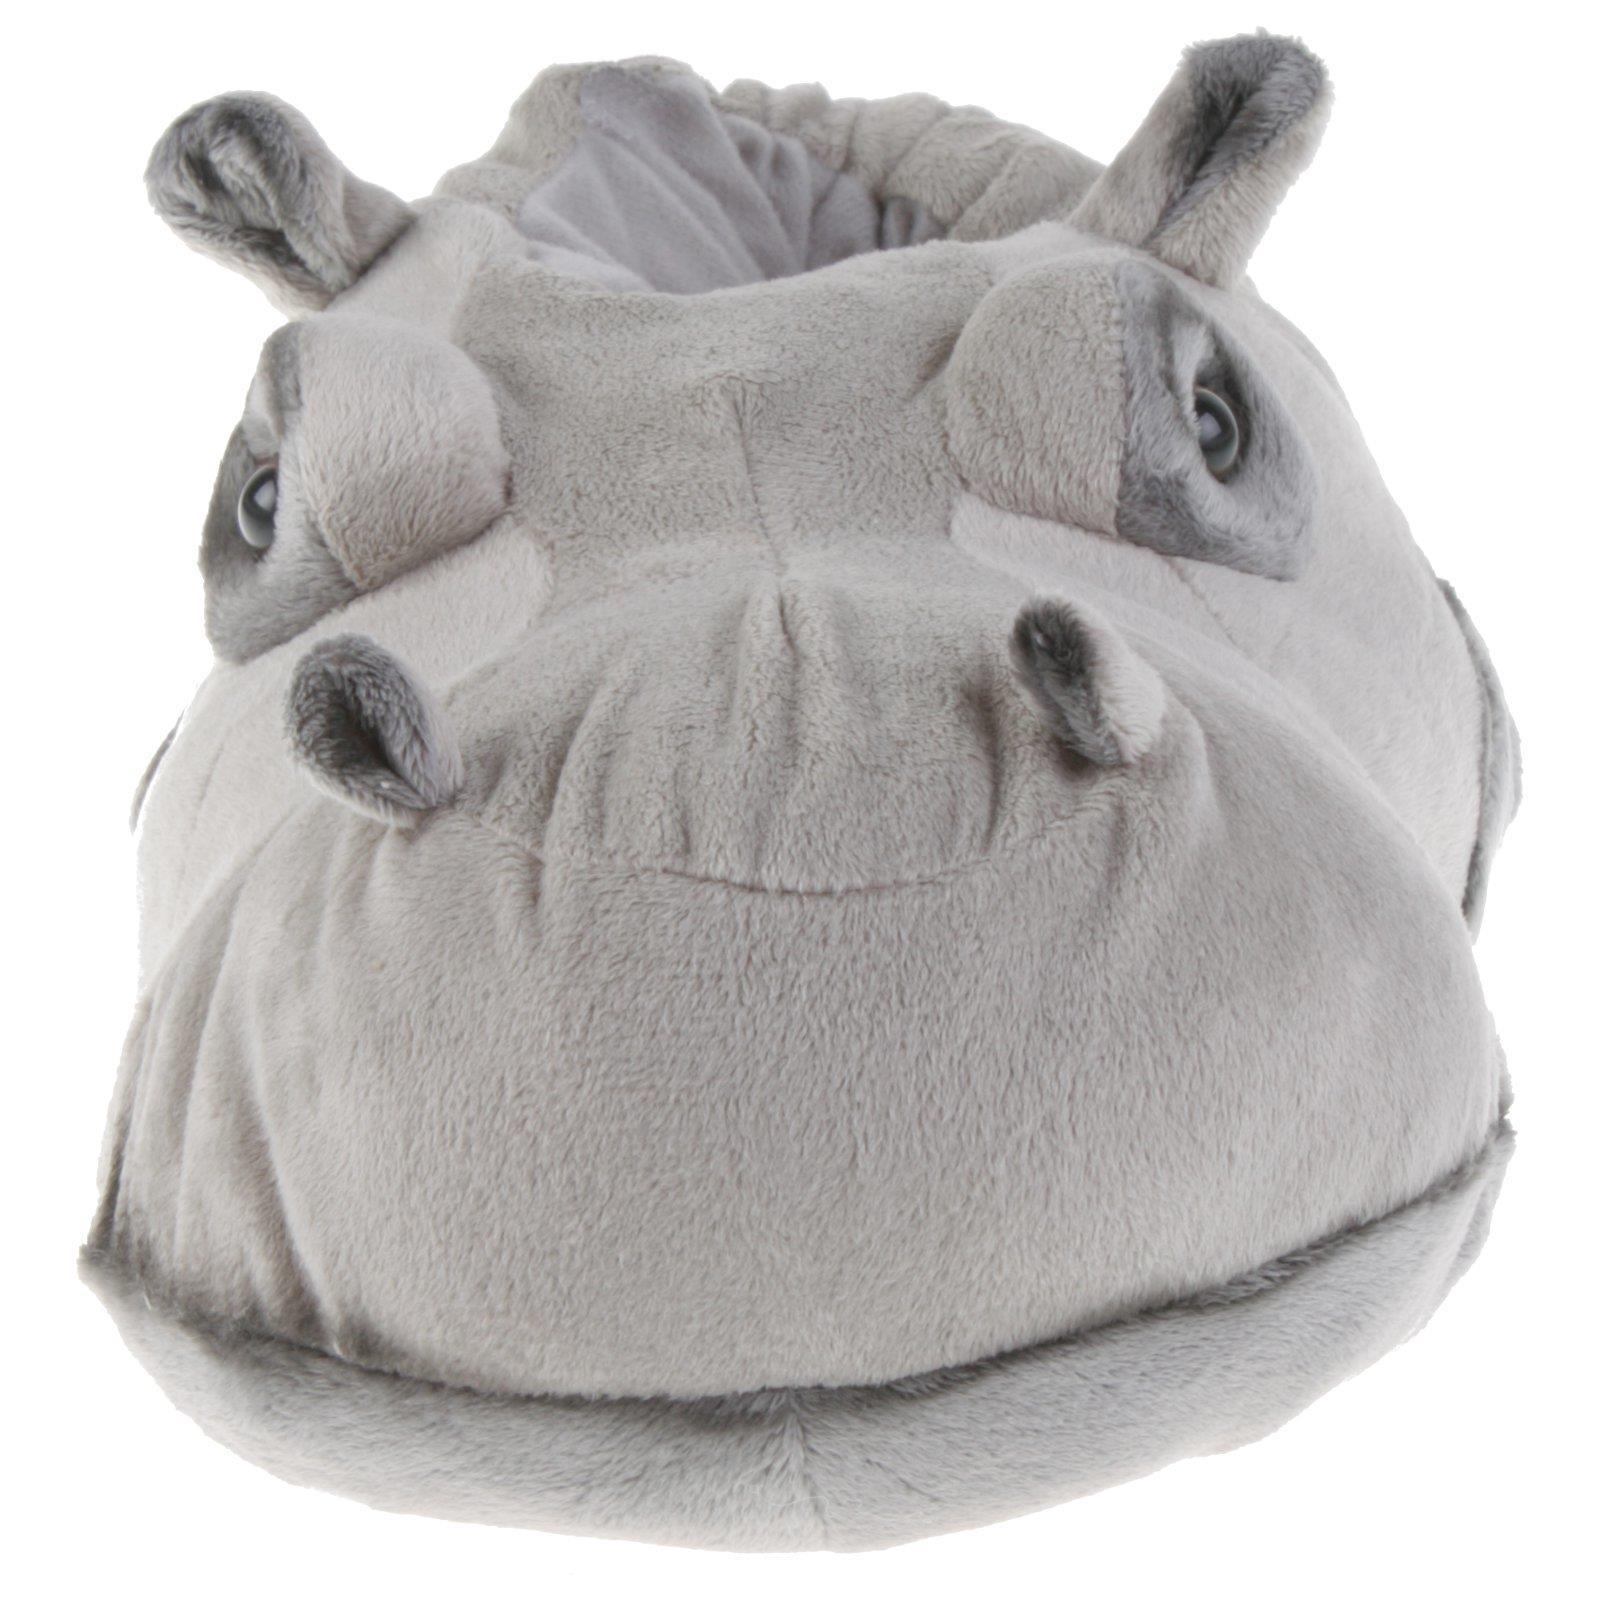 Flusspferd-Hippo-Tier-Hausschuhe-Pantoffel-Schlappen-Nilpferd-Pluesch-36-48 Indexbild 11